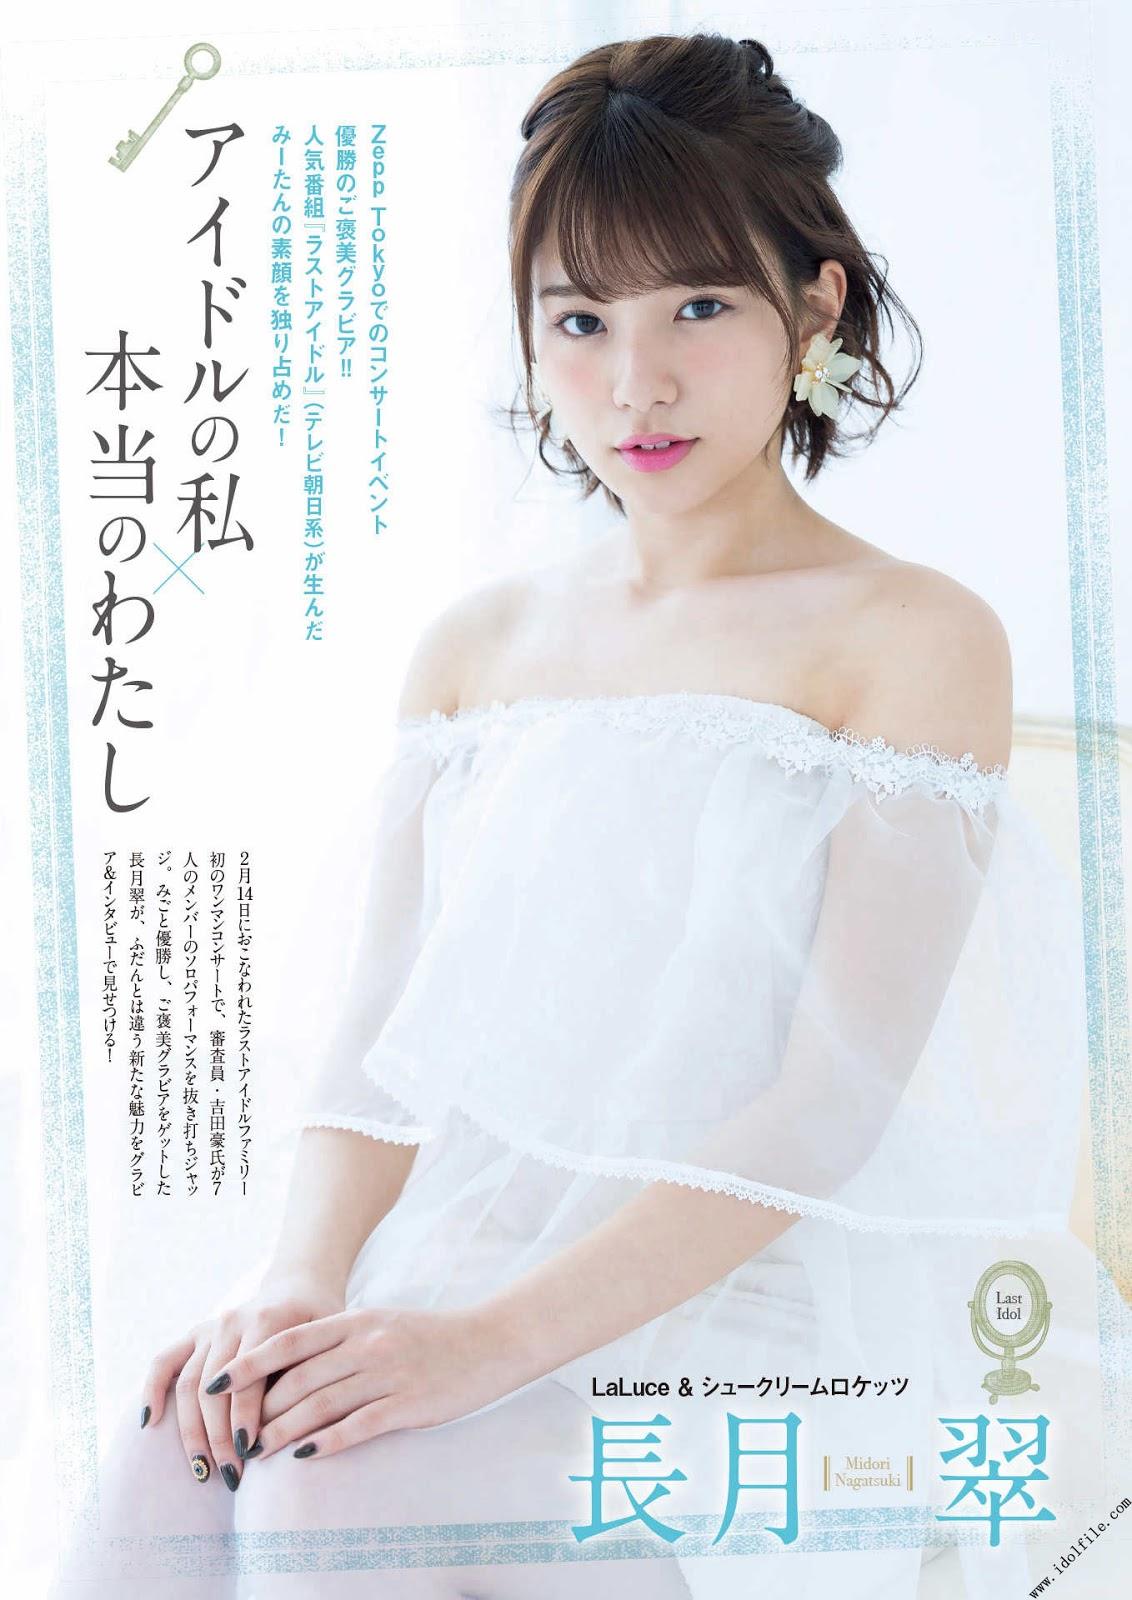 Nagatsuki Midori 長月翠, FLASHスペシャルグラビアBEST 2018GW号 Last Idol